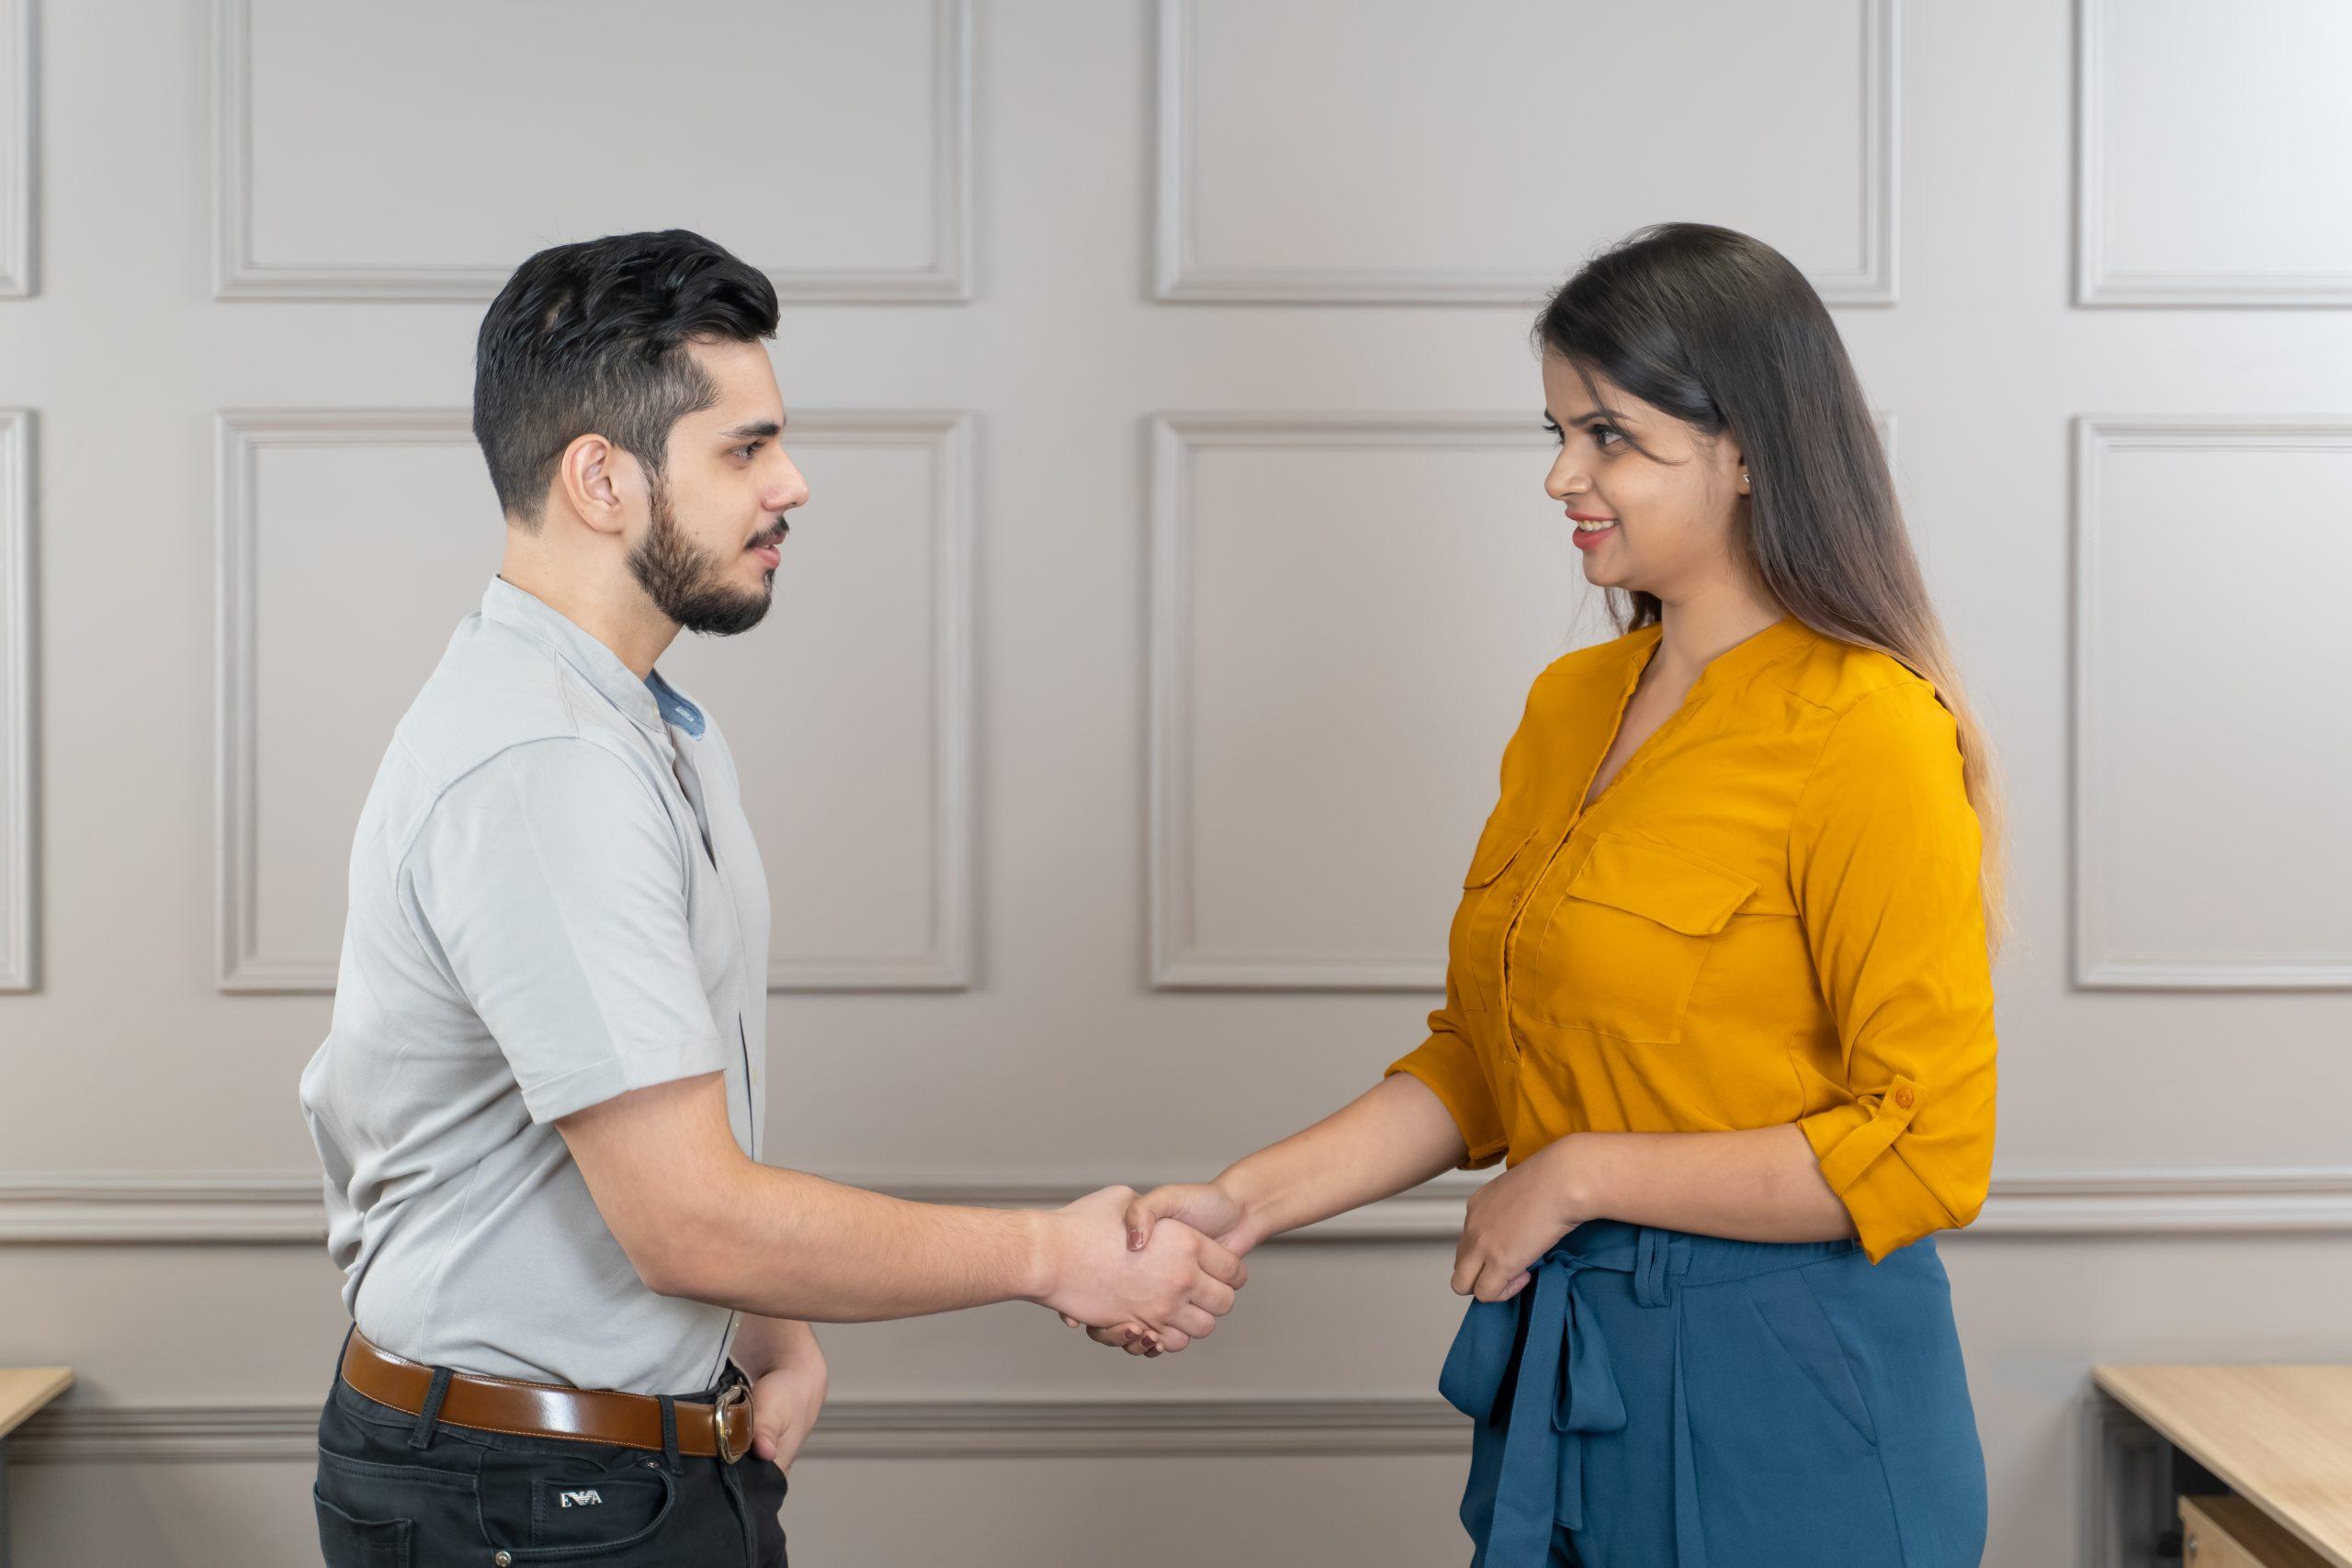 Entrepreneurs making a deal